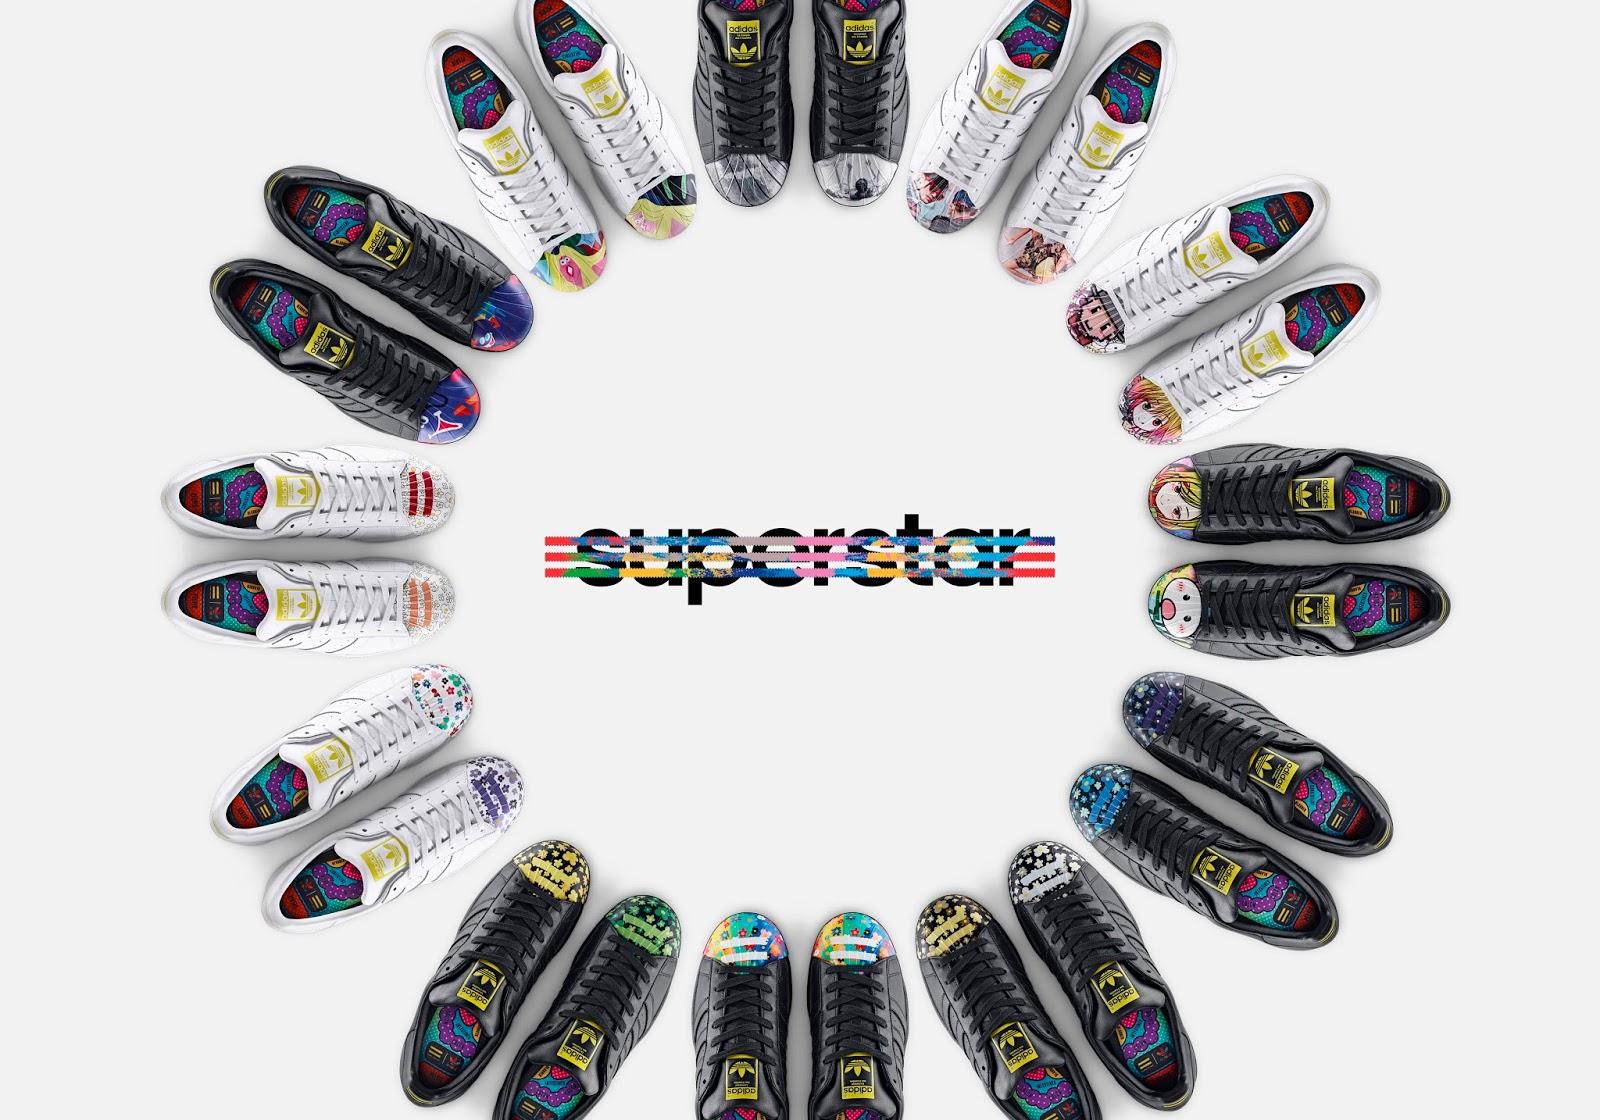 Six Feet Originals Down adidas Feet Originals Feet Superstar adidas Down 1b2ae0